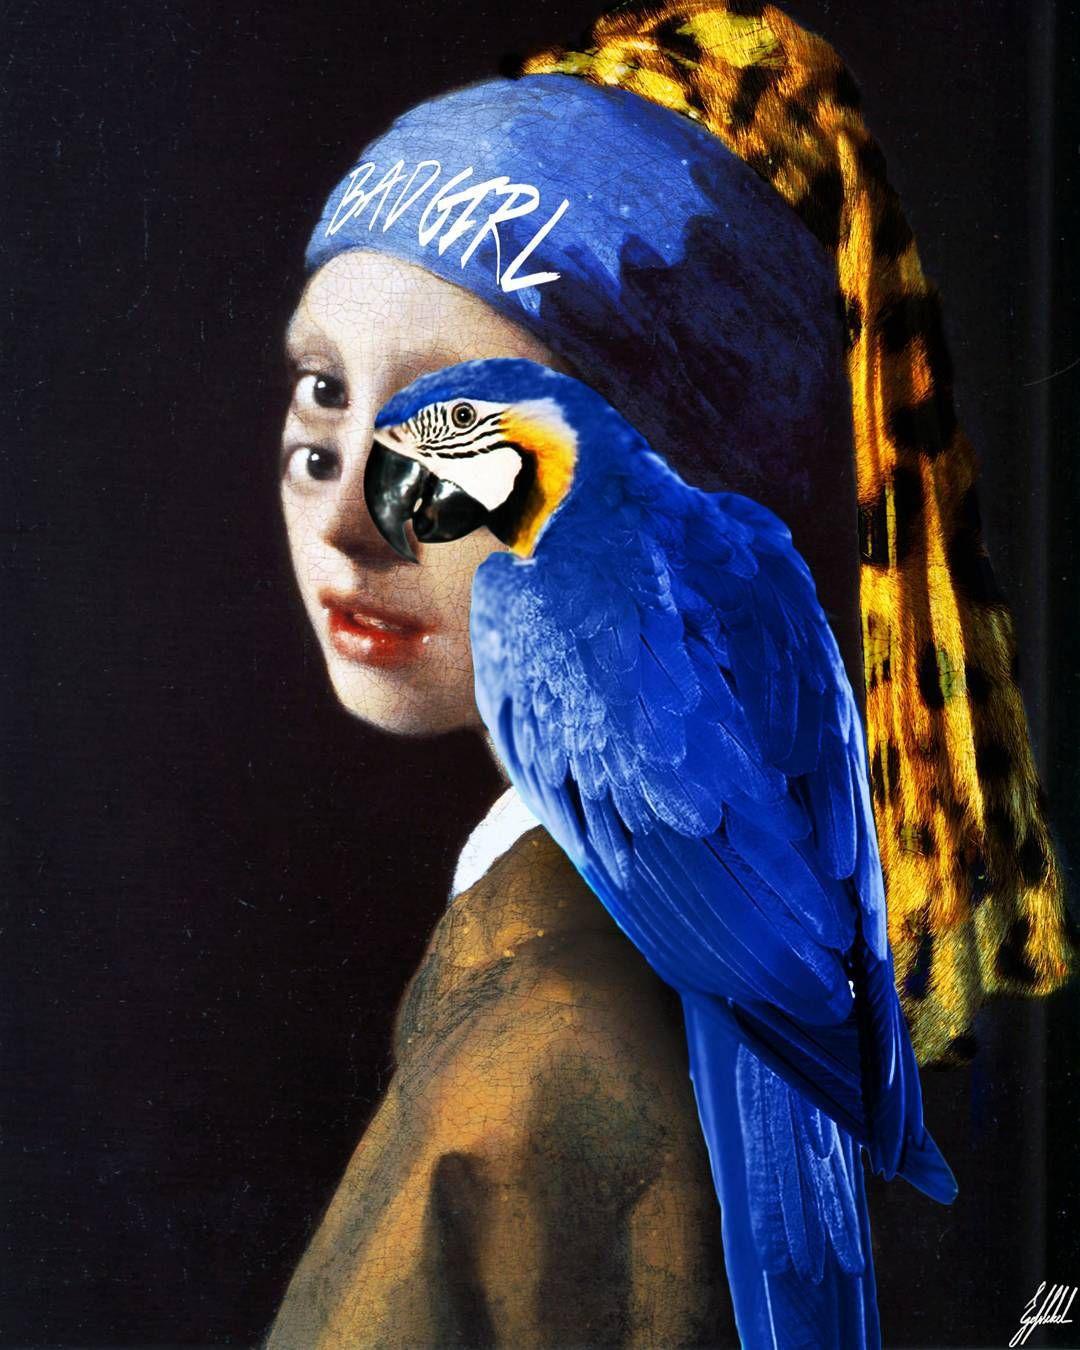 #girl #pearl #earring #vermeer #parrot #animal #art #artwork  Through the eyes of an animal.  Girl with a pearl earring by 17th-century Dutch painter Johannes Vermeer.